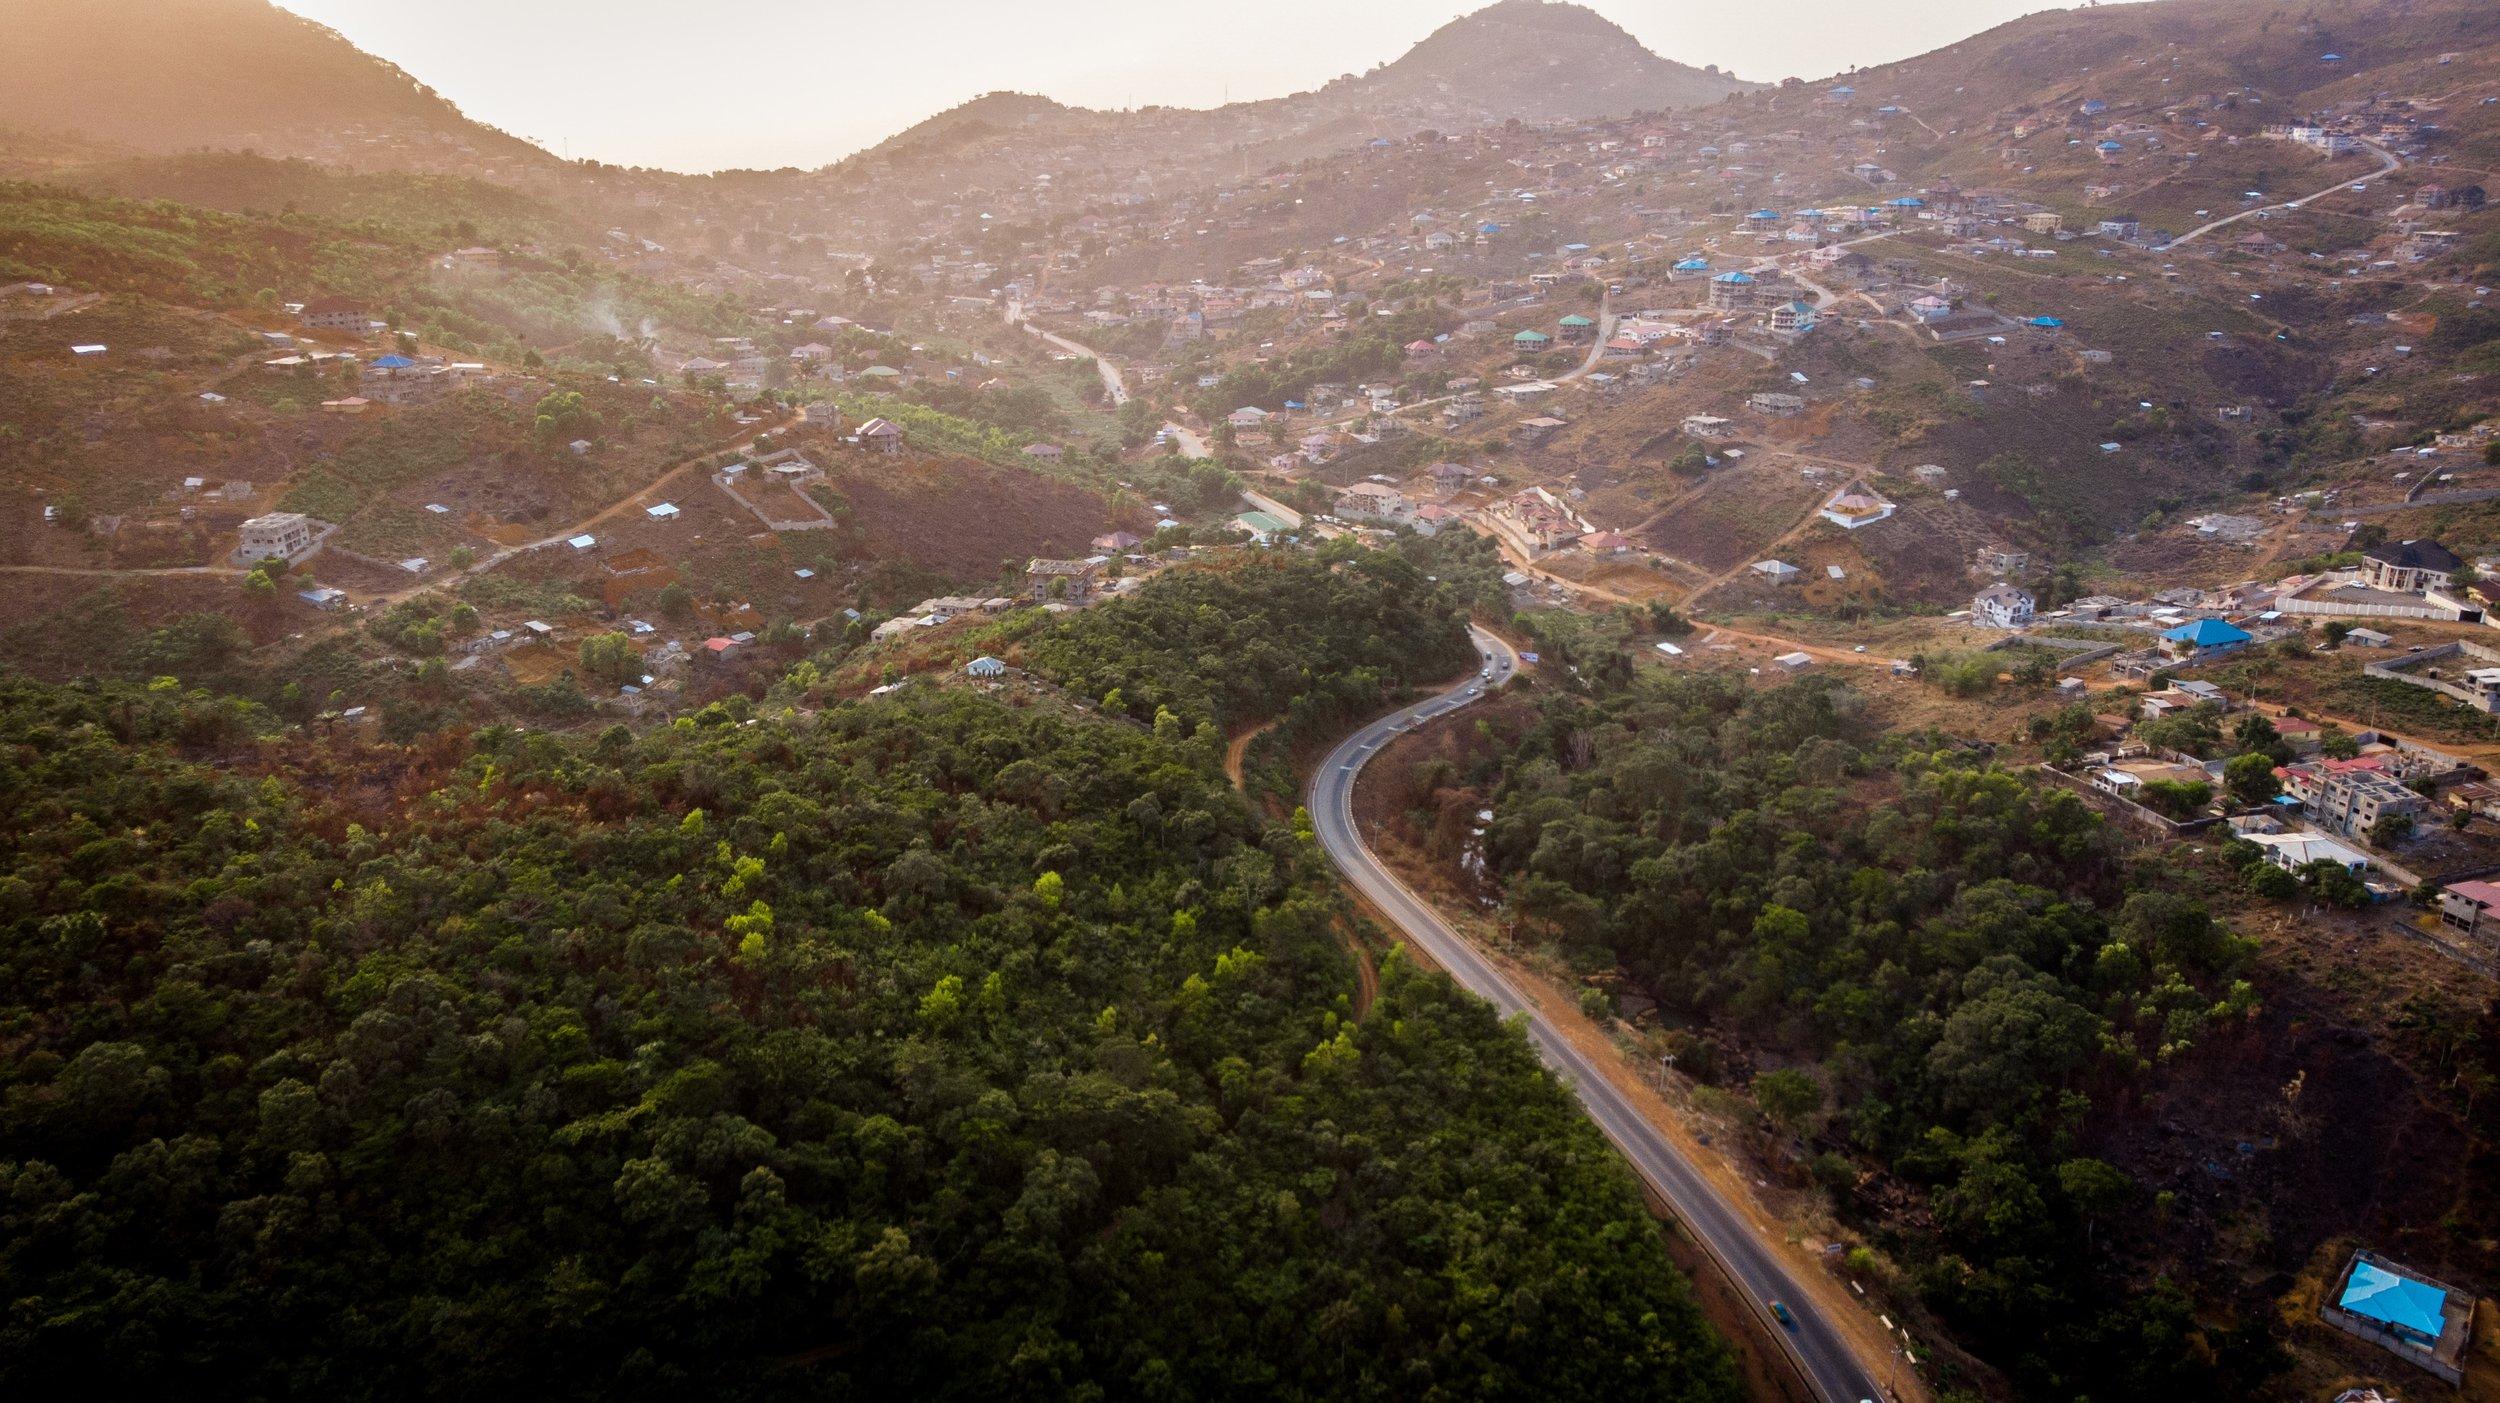 Sierraleone-vickieremoe-environment-rainforest-conservation-photos-radwanskeiky2.JPG